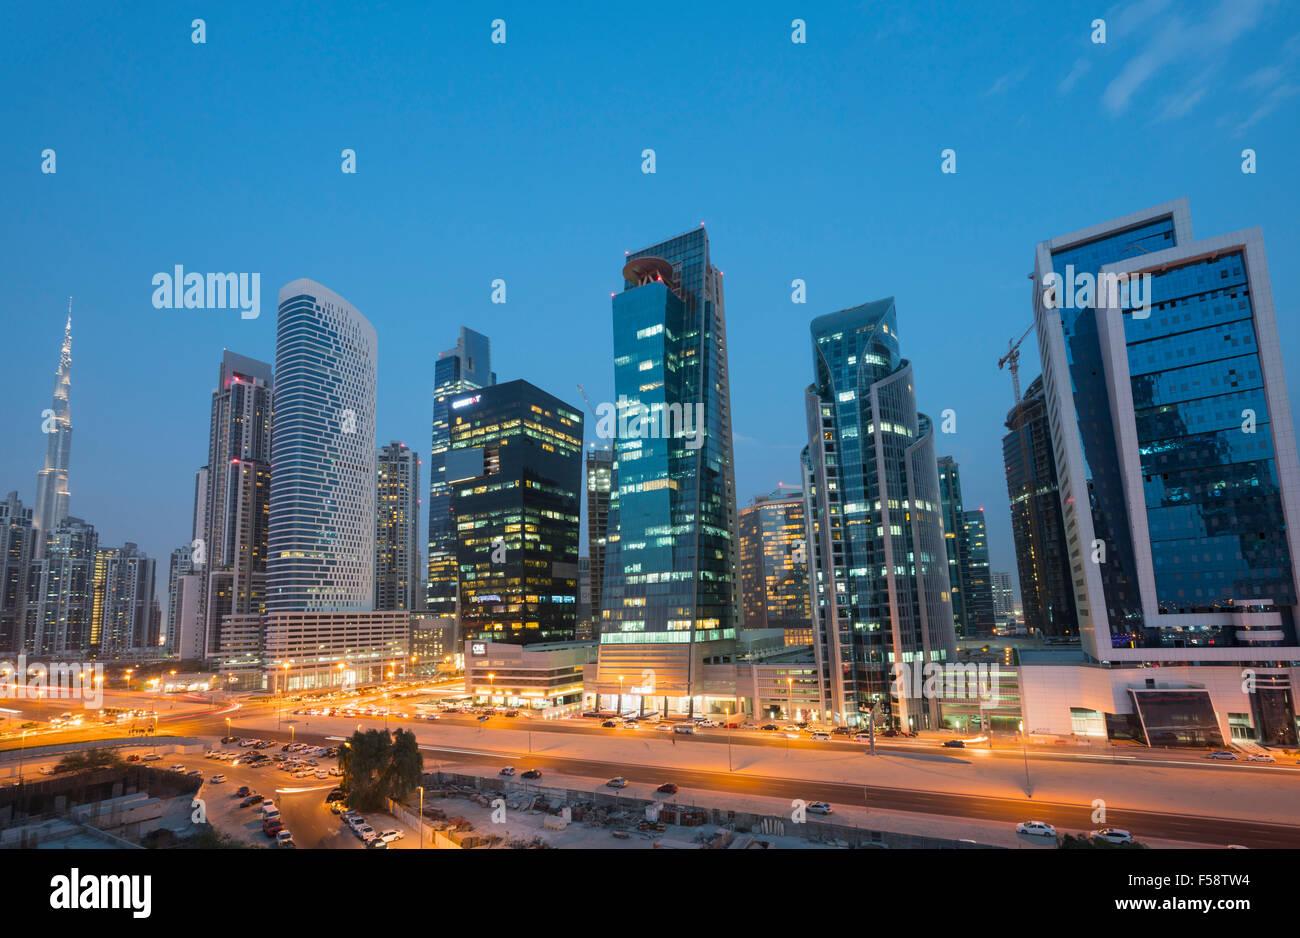 Skyline di nuove torri di uffici di notte nella baia di business district di Dubai Emirati Arabi Uniti Immagini Stock